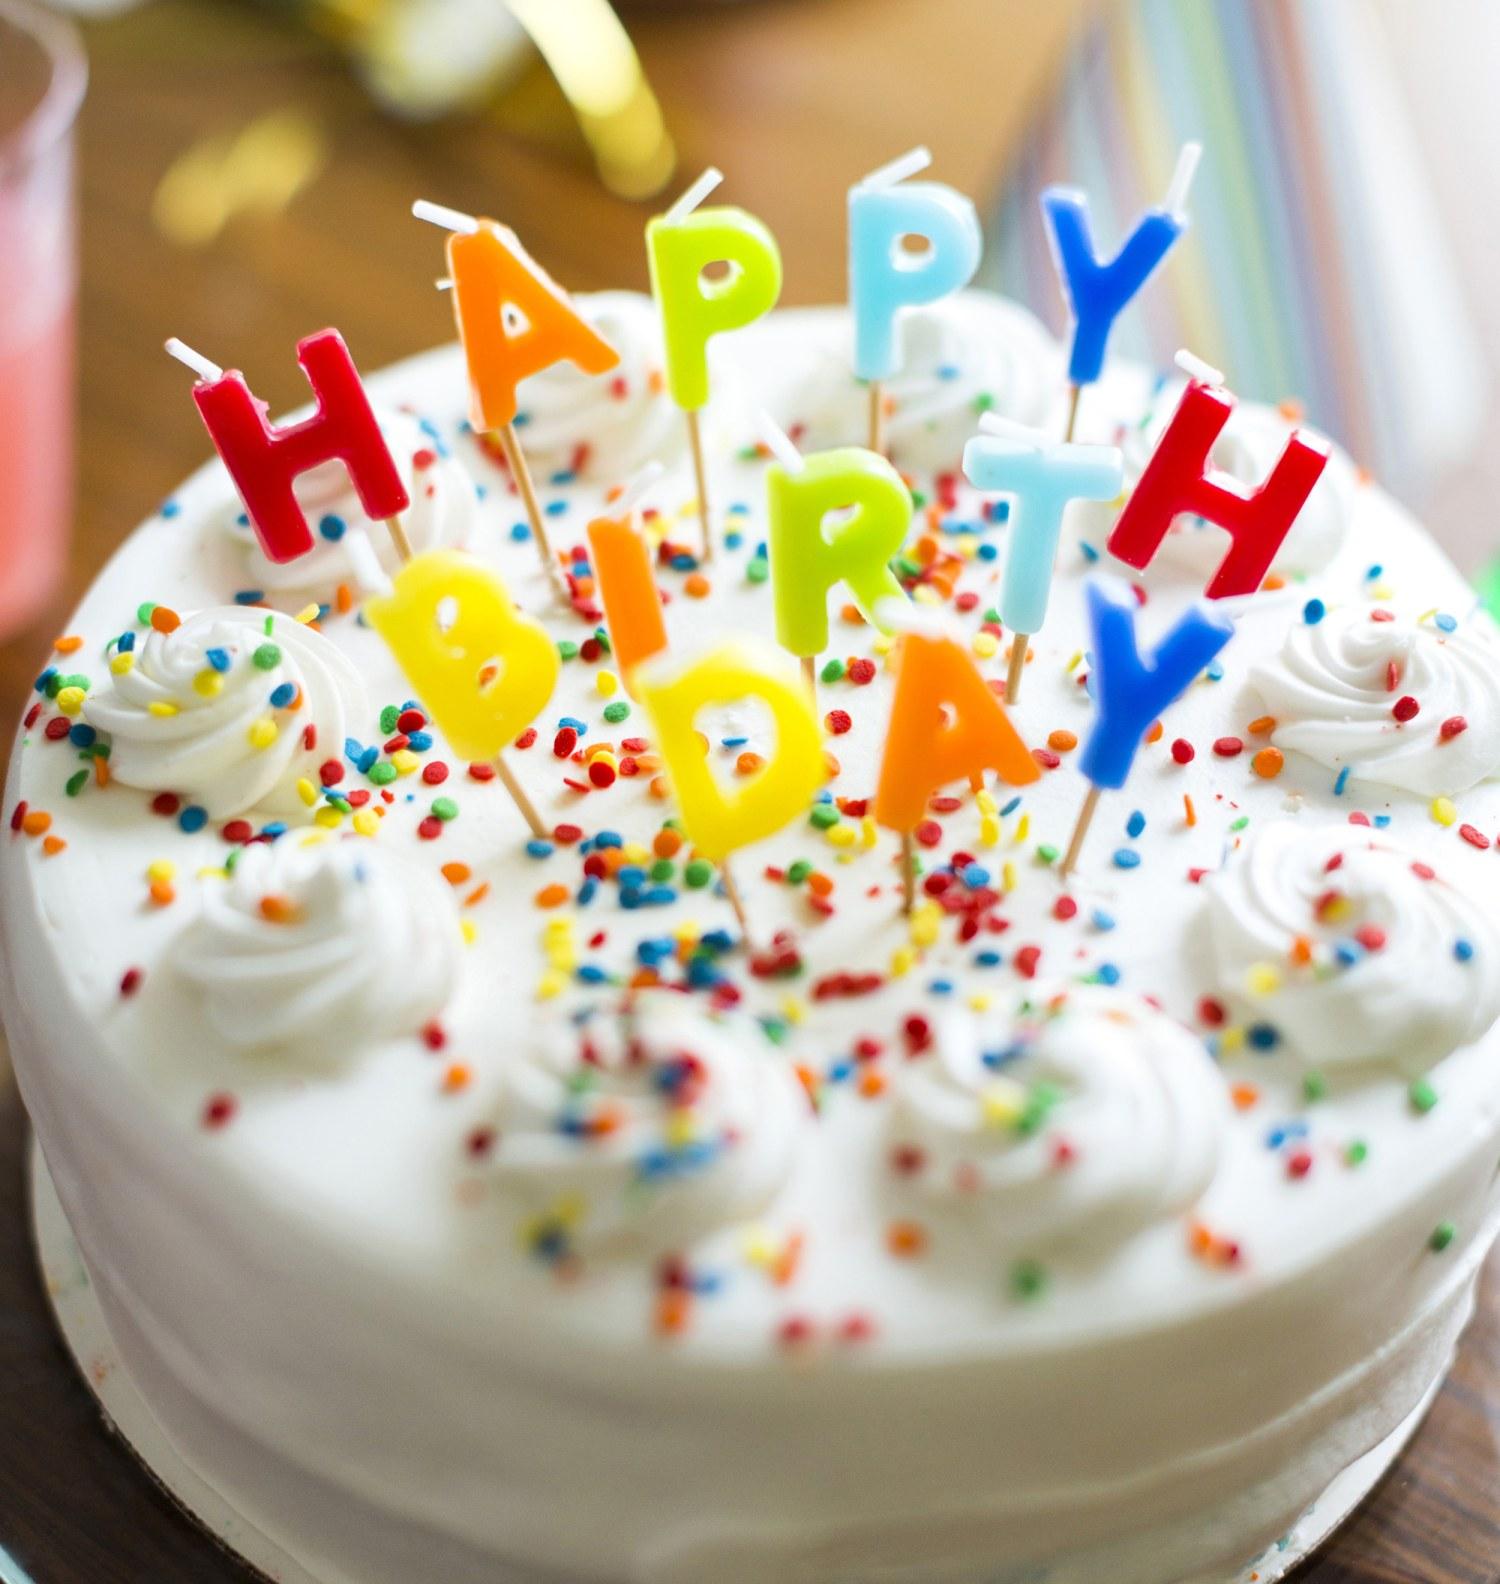 150922-happy-birthday-10p.jpg